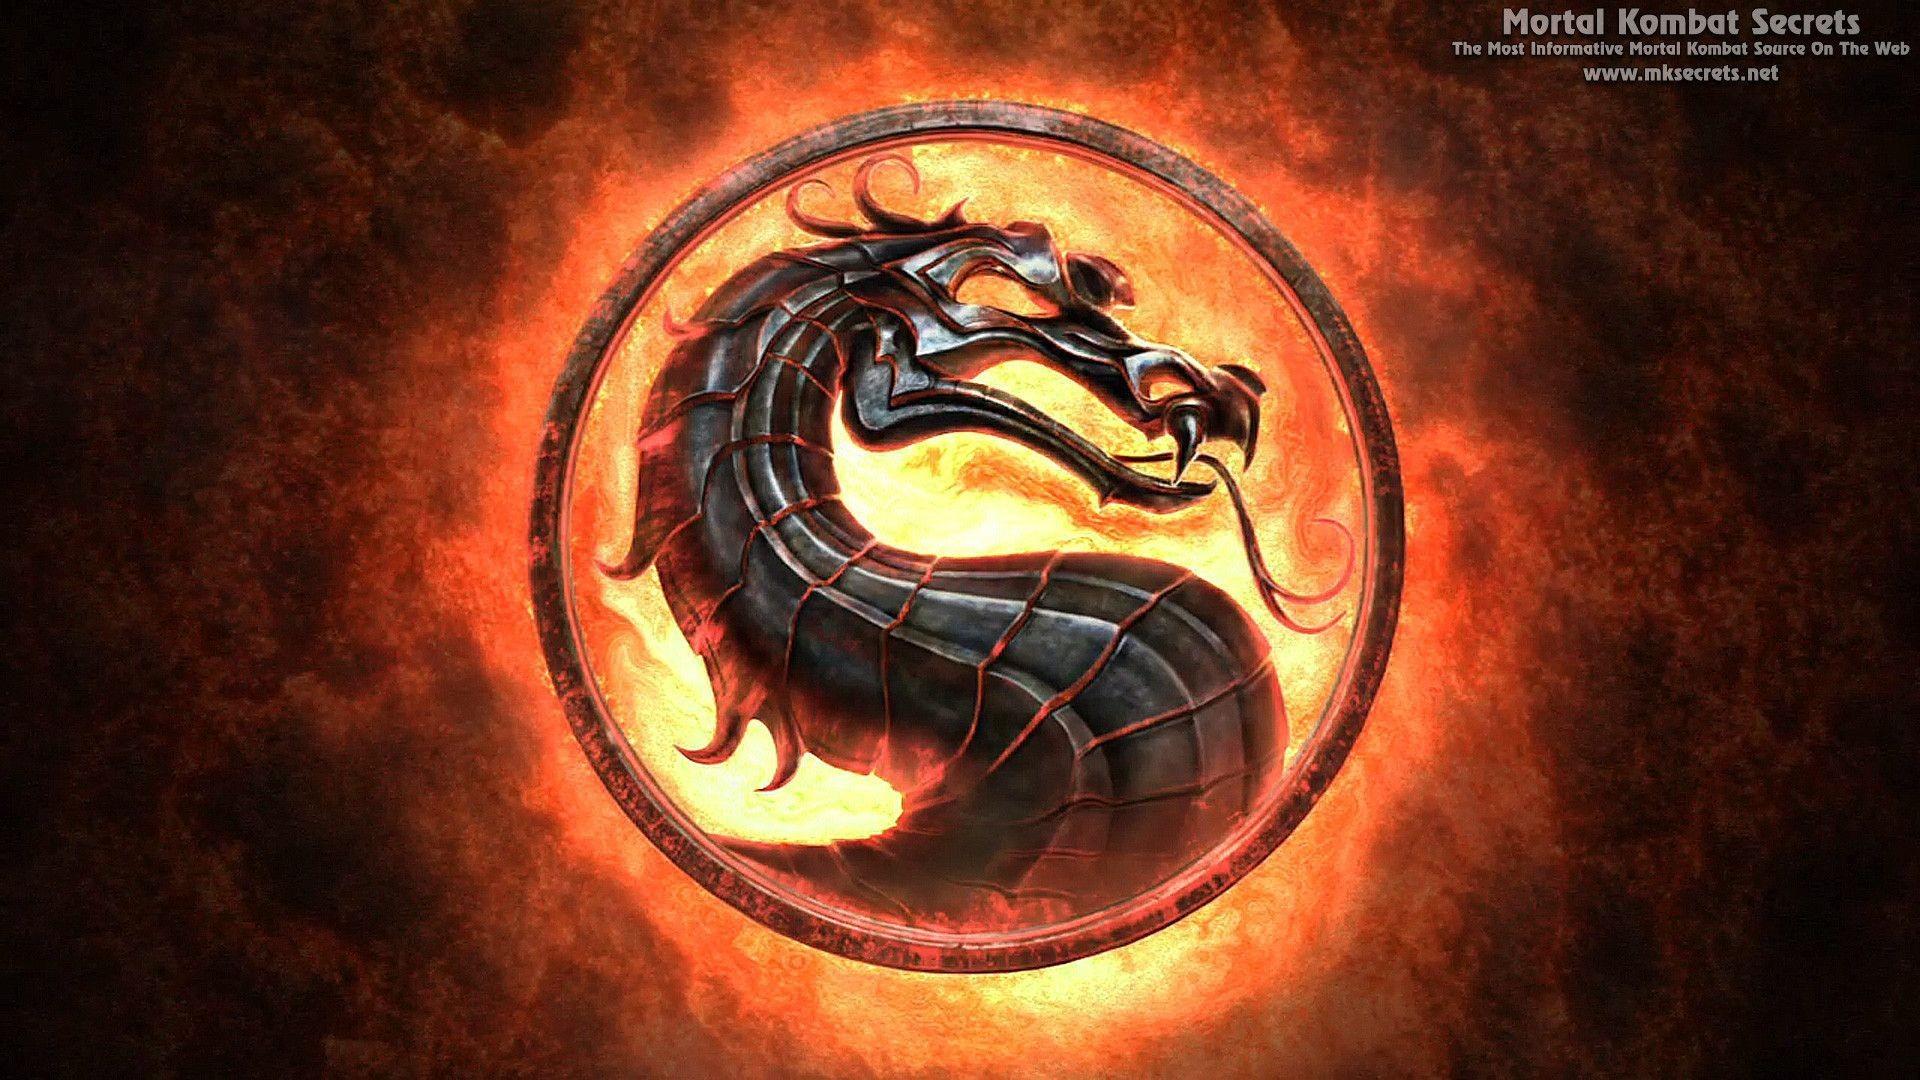 Megapost Wallpapers Mortal Kombat X HD Wide Screen Wallpaper Imagenes De Mortal  Kombat Wallpapers Wallpapers)